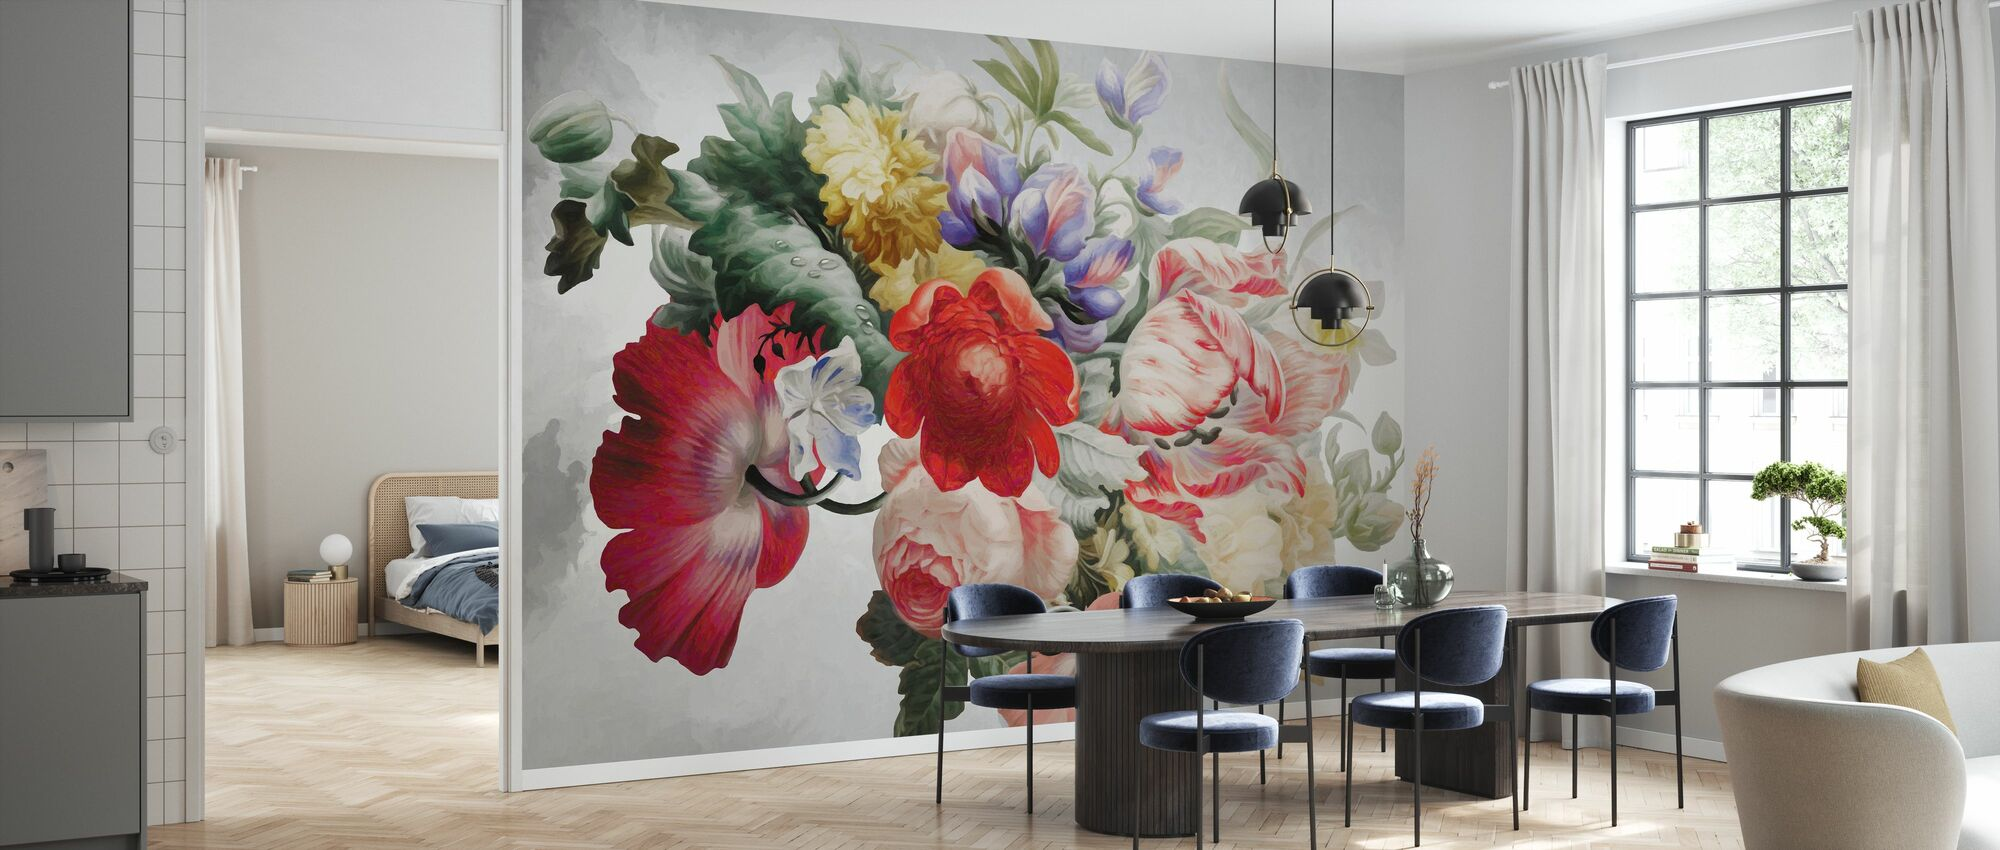 Tender Tulips - Wallpaper - Kitchen